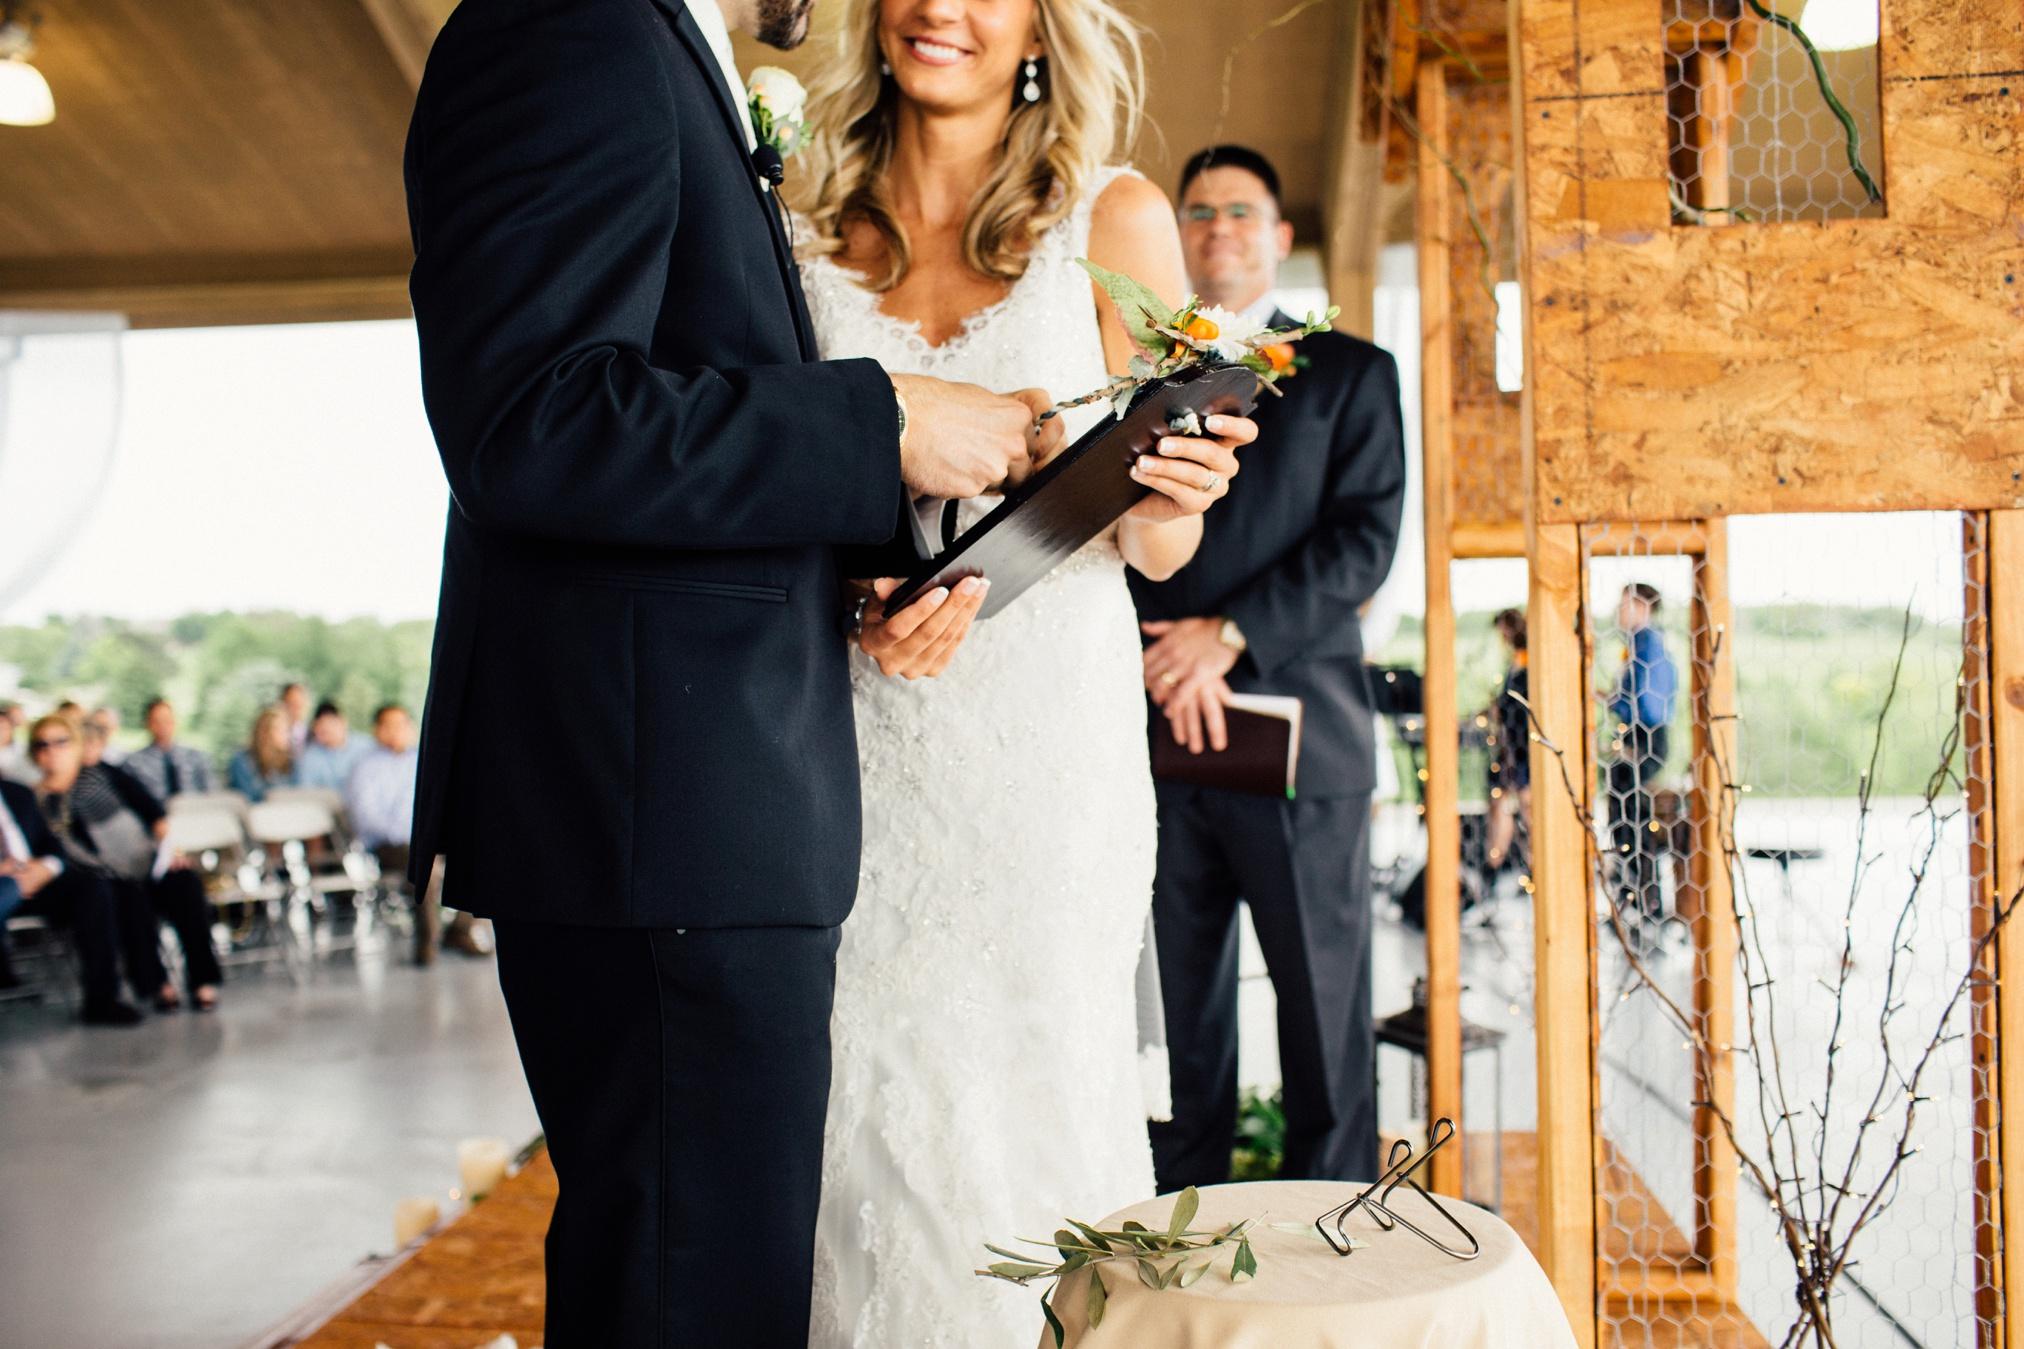 schmid_wedding-526.jpg